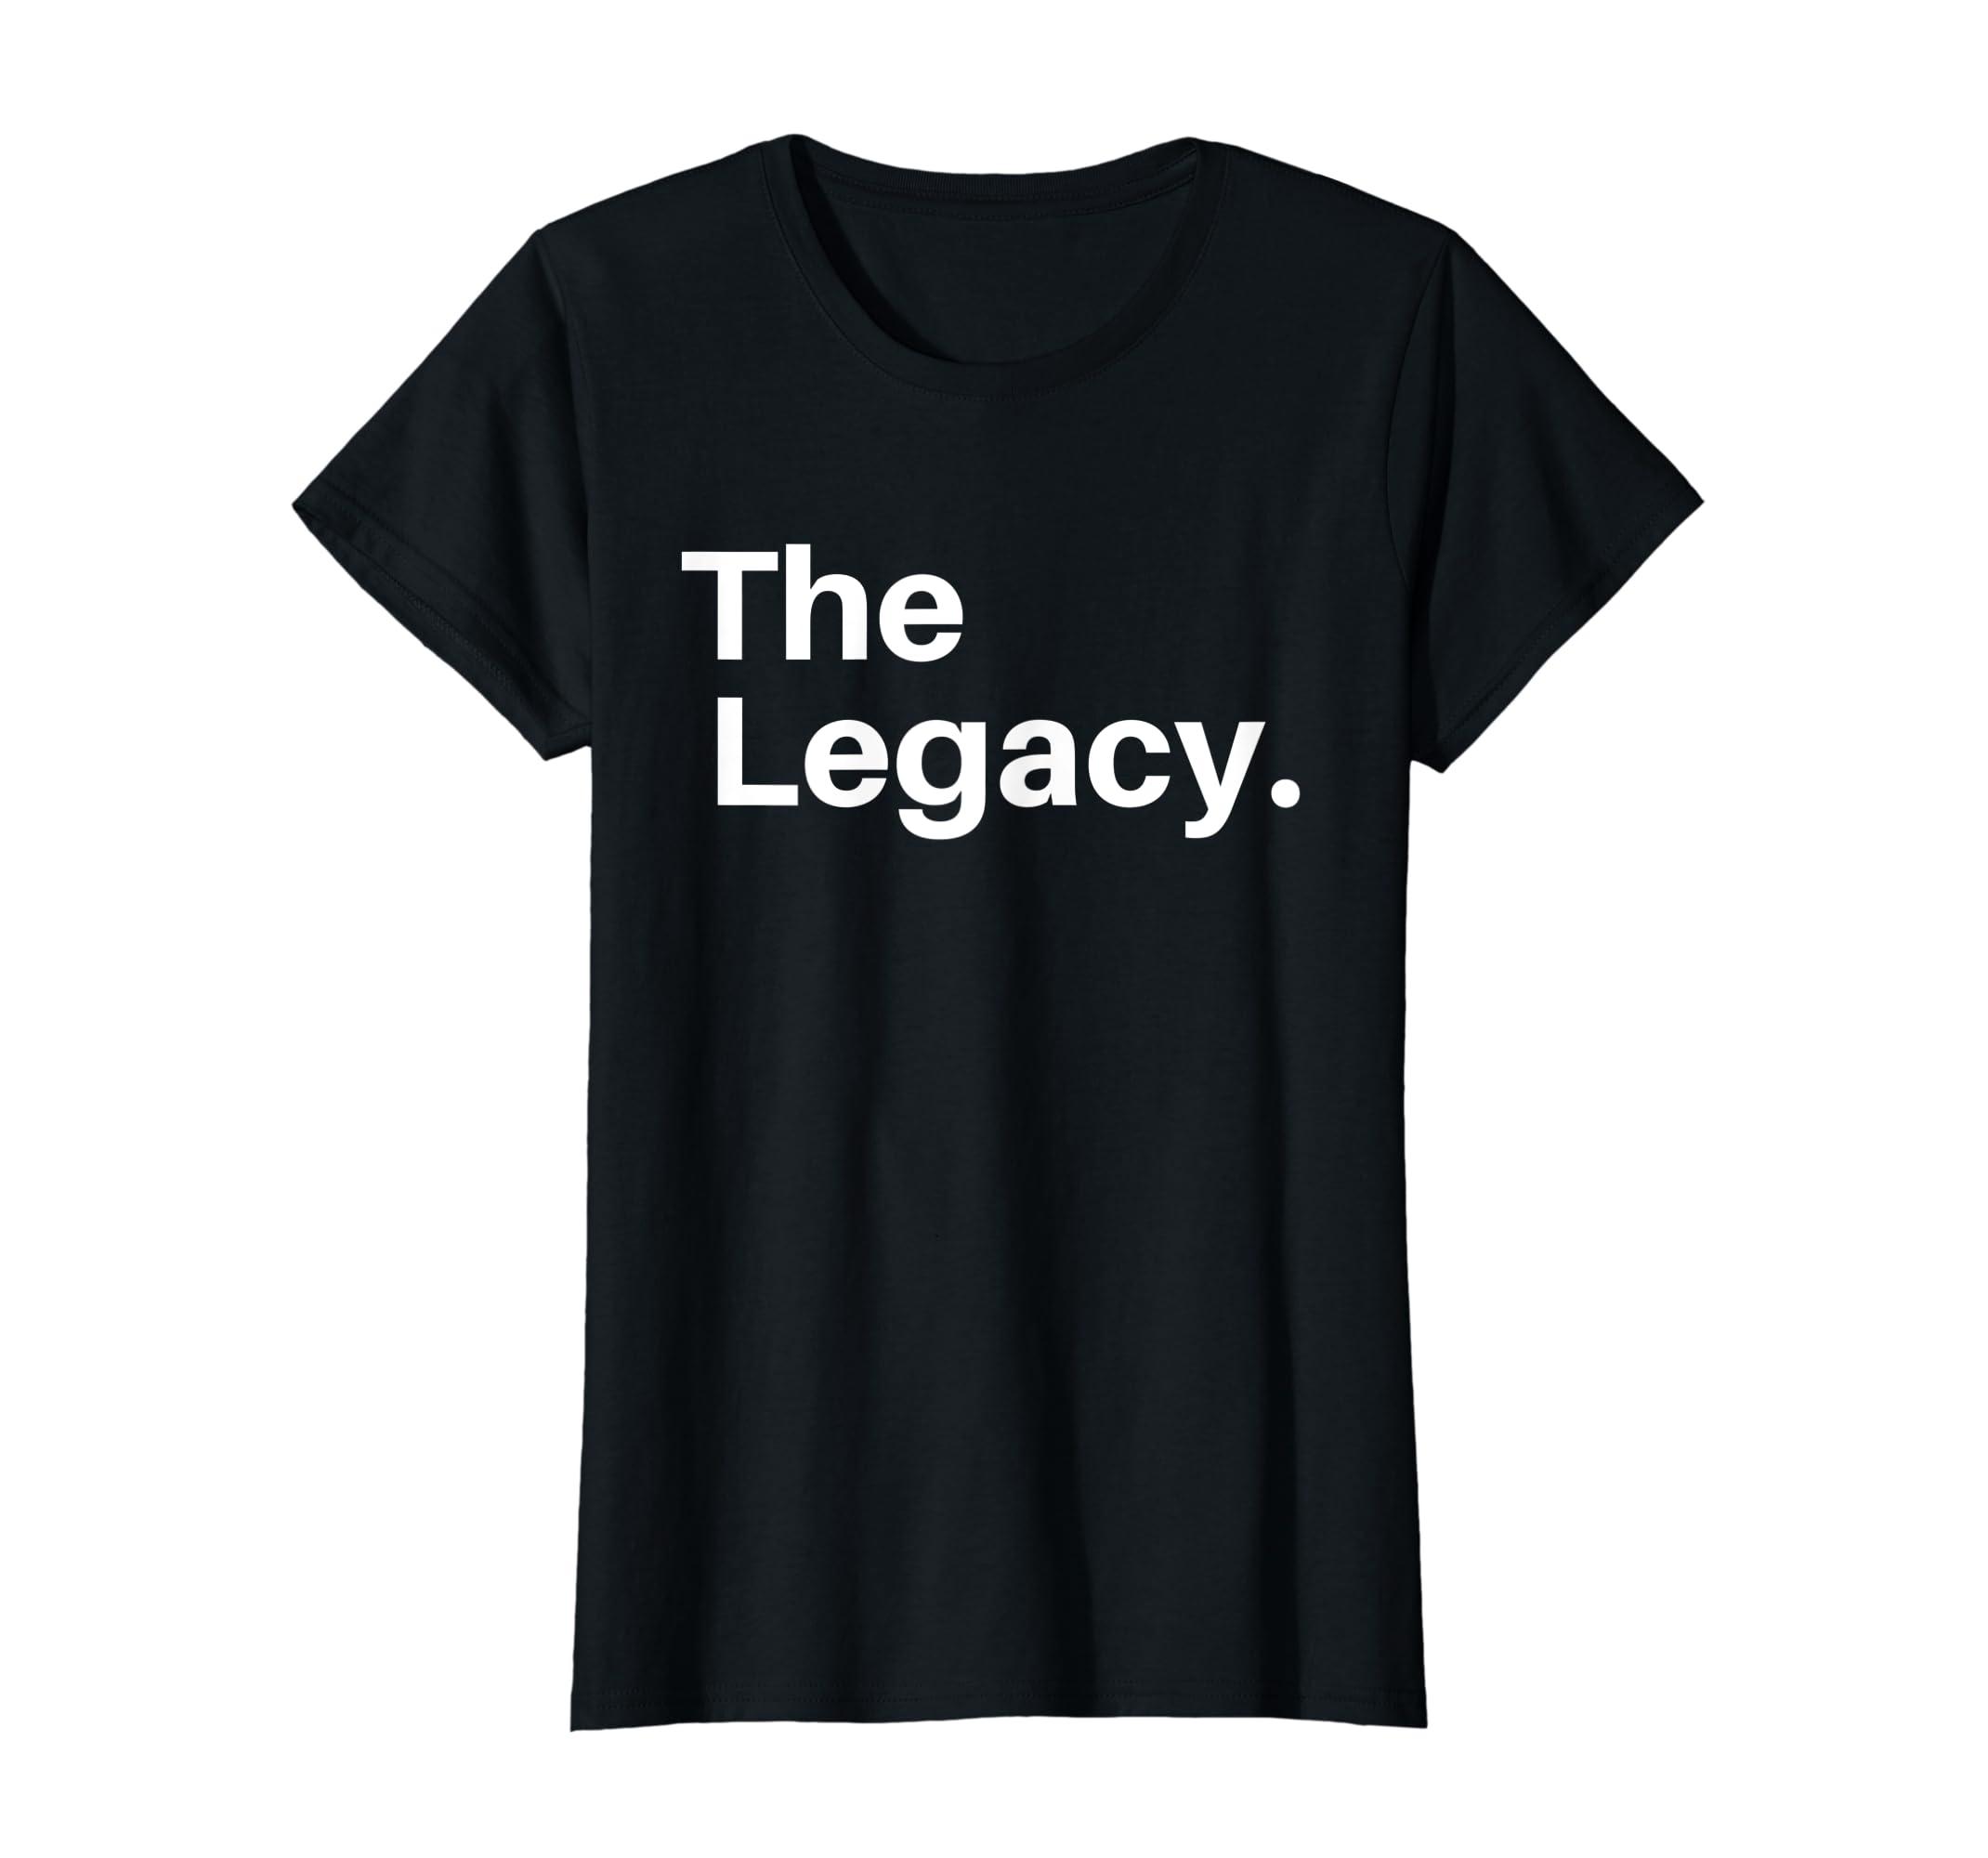 15984fbc1 Amazon.com  The Original The Remix The Legacy Shirt for Kids Boys Girl   Clothing